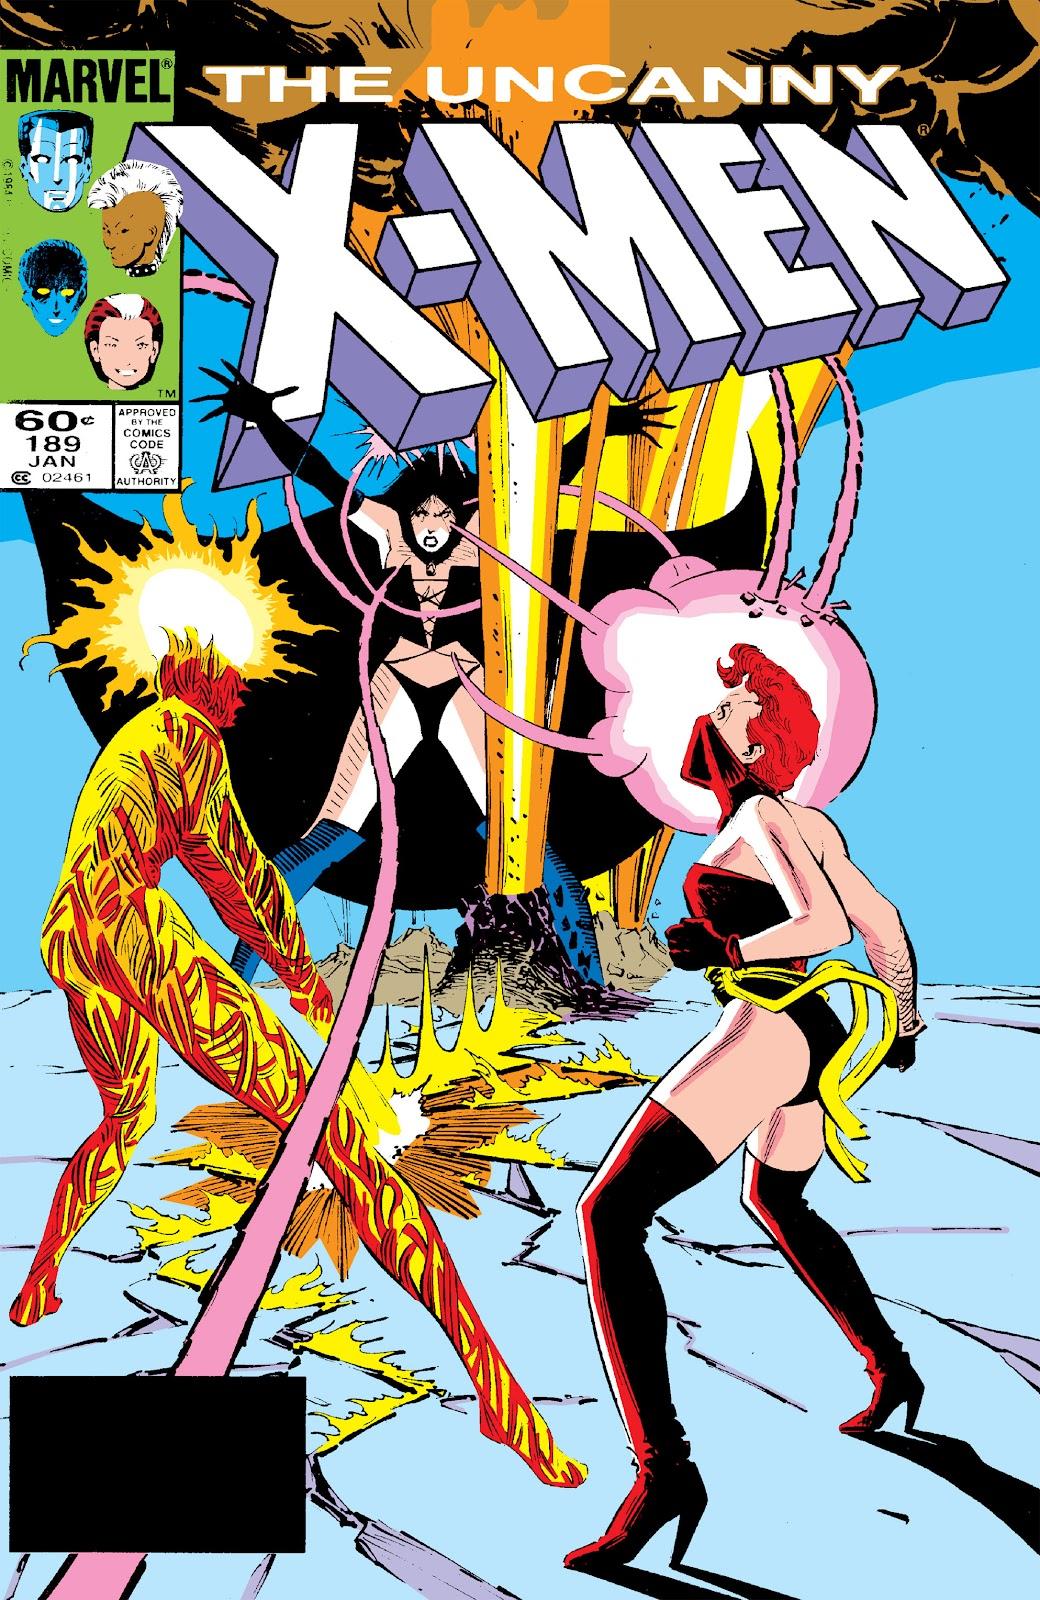 Uncanny X-Men (1963) issue 189 - Page 1